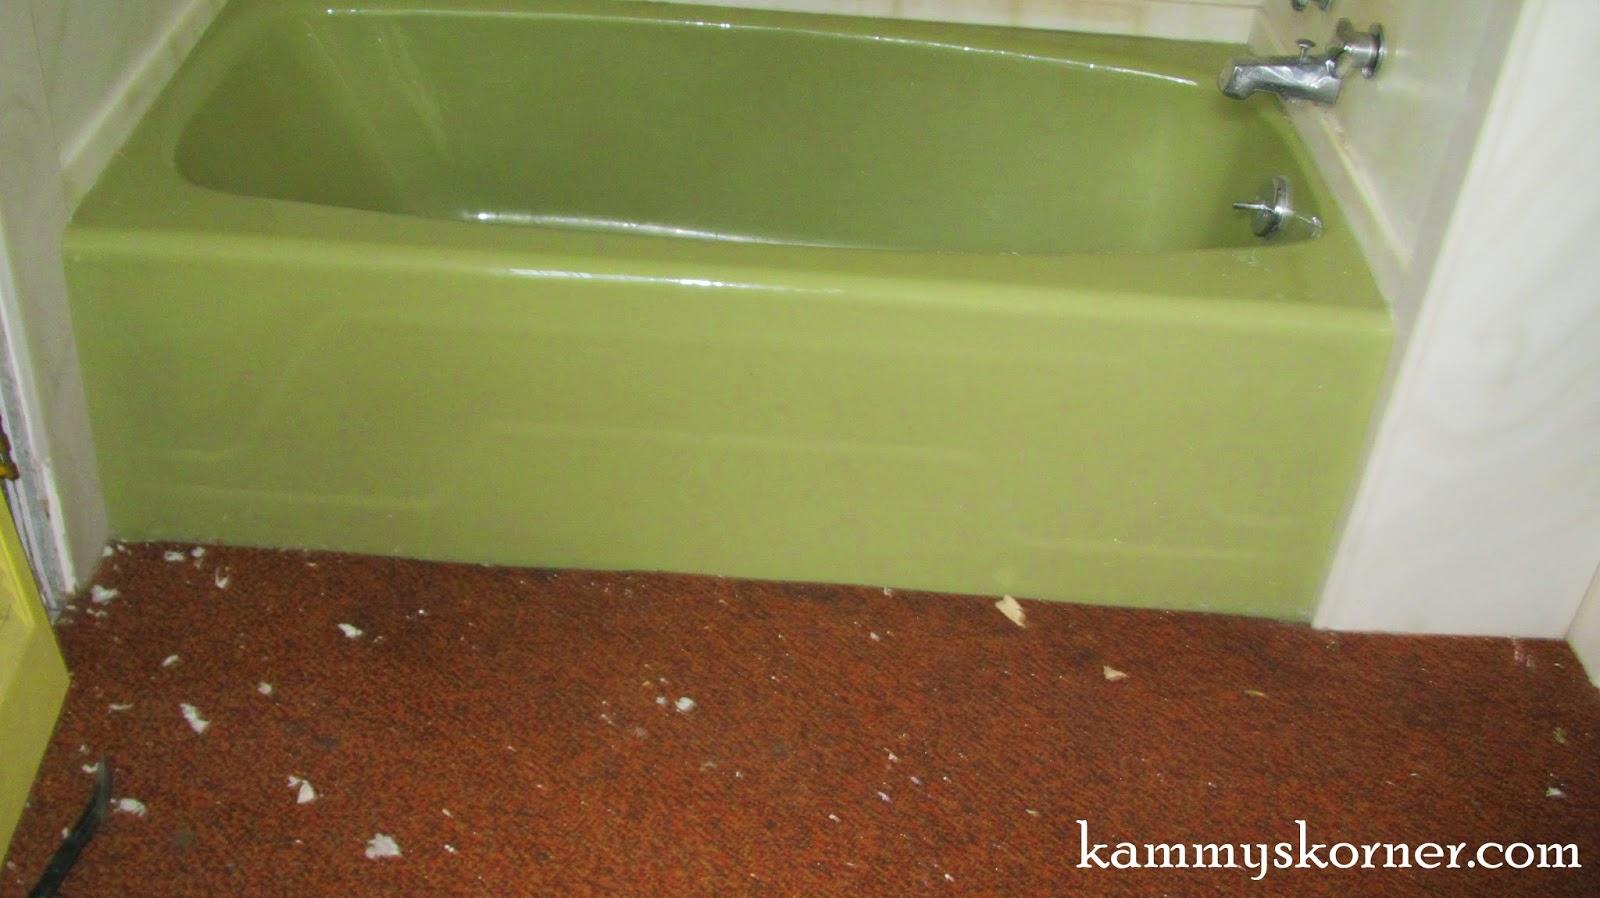 Rockin The Avocado Green Bathtub For Now